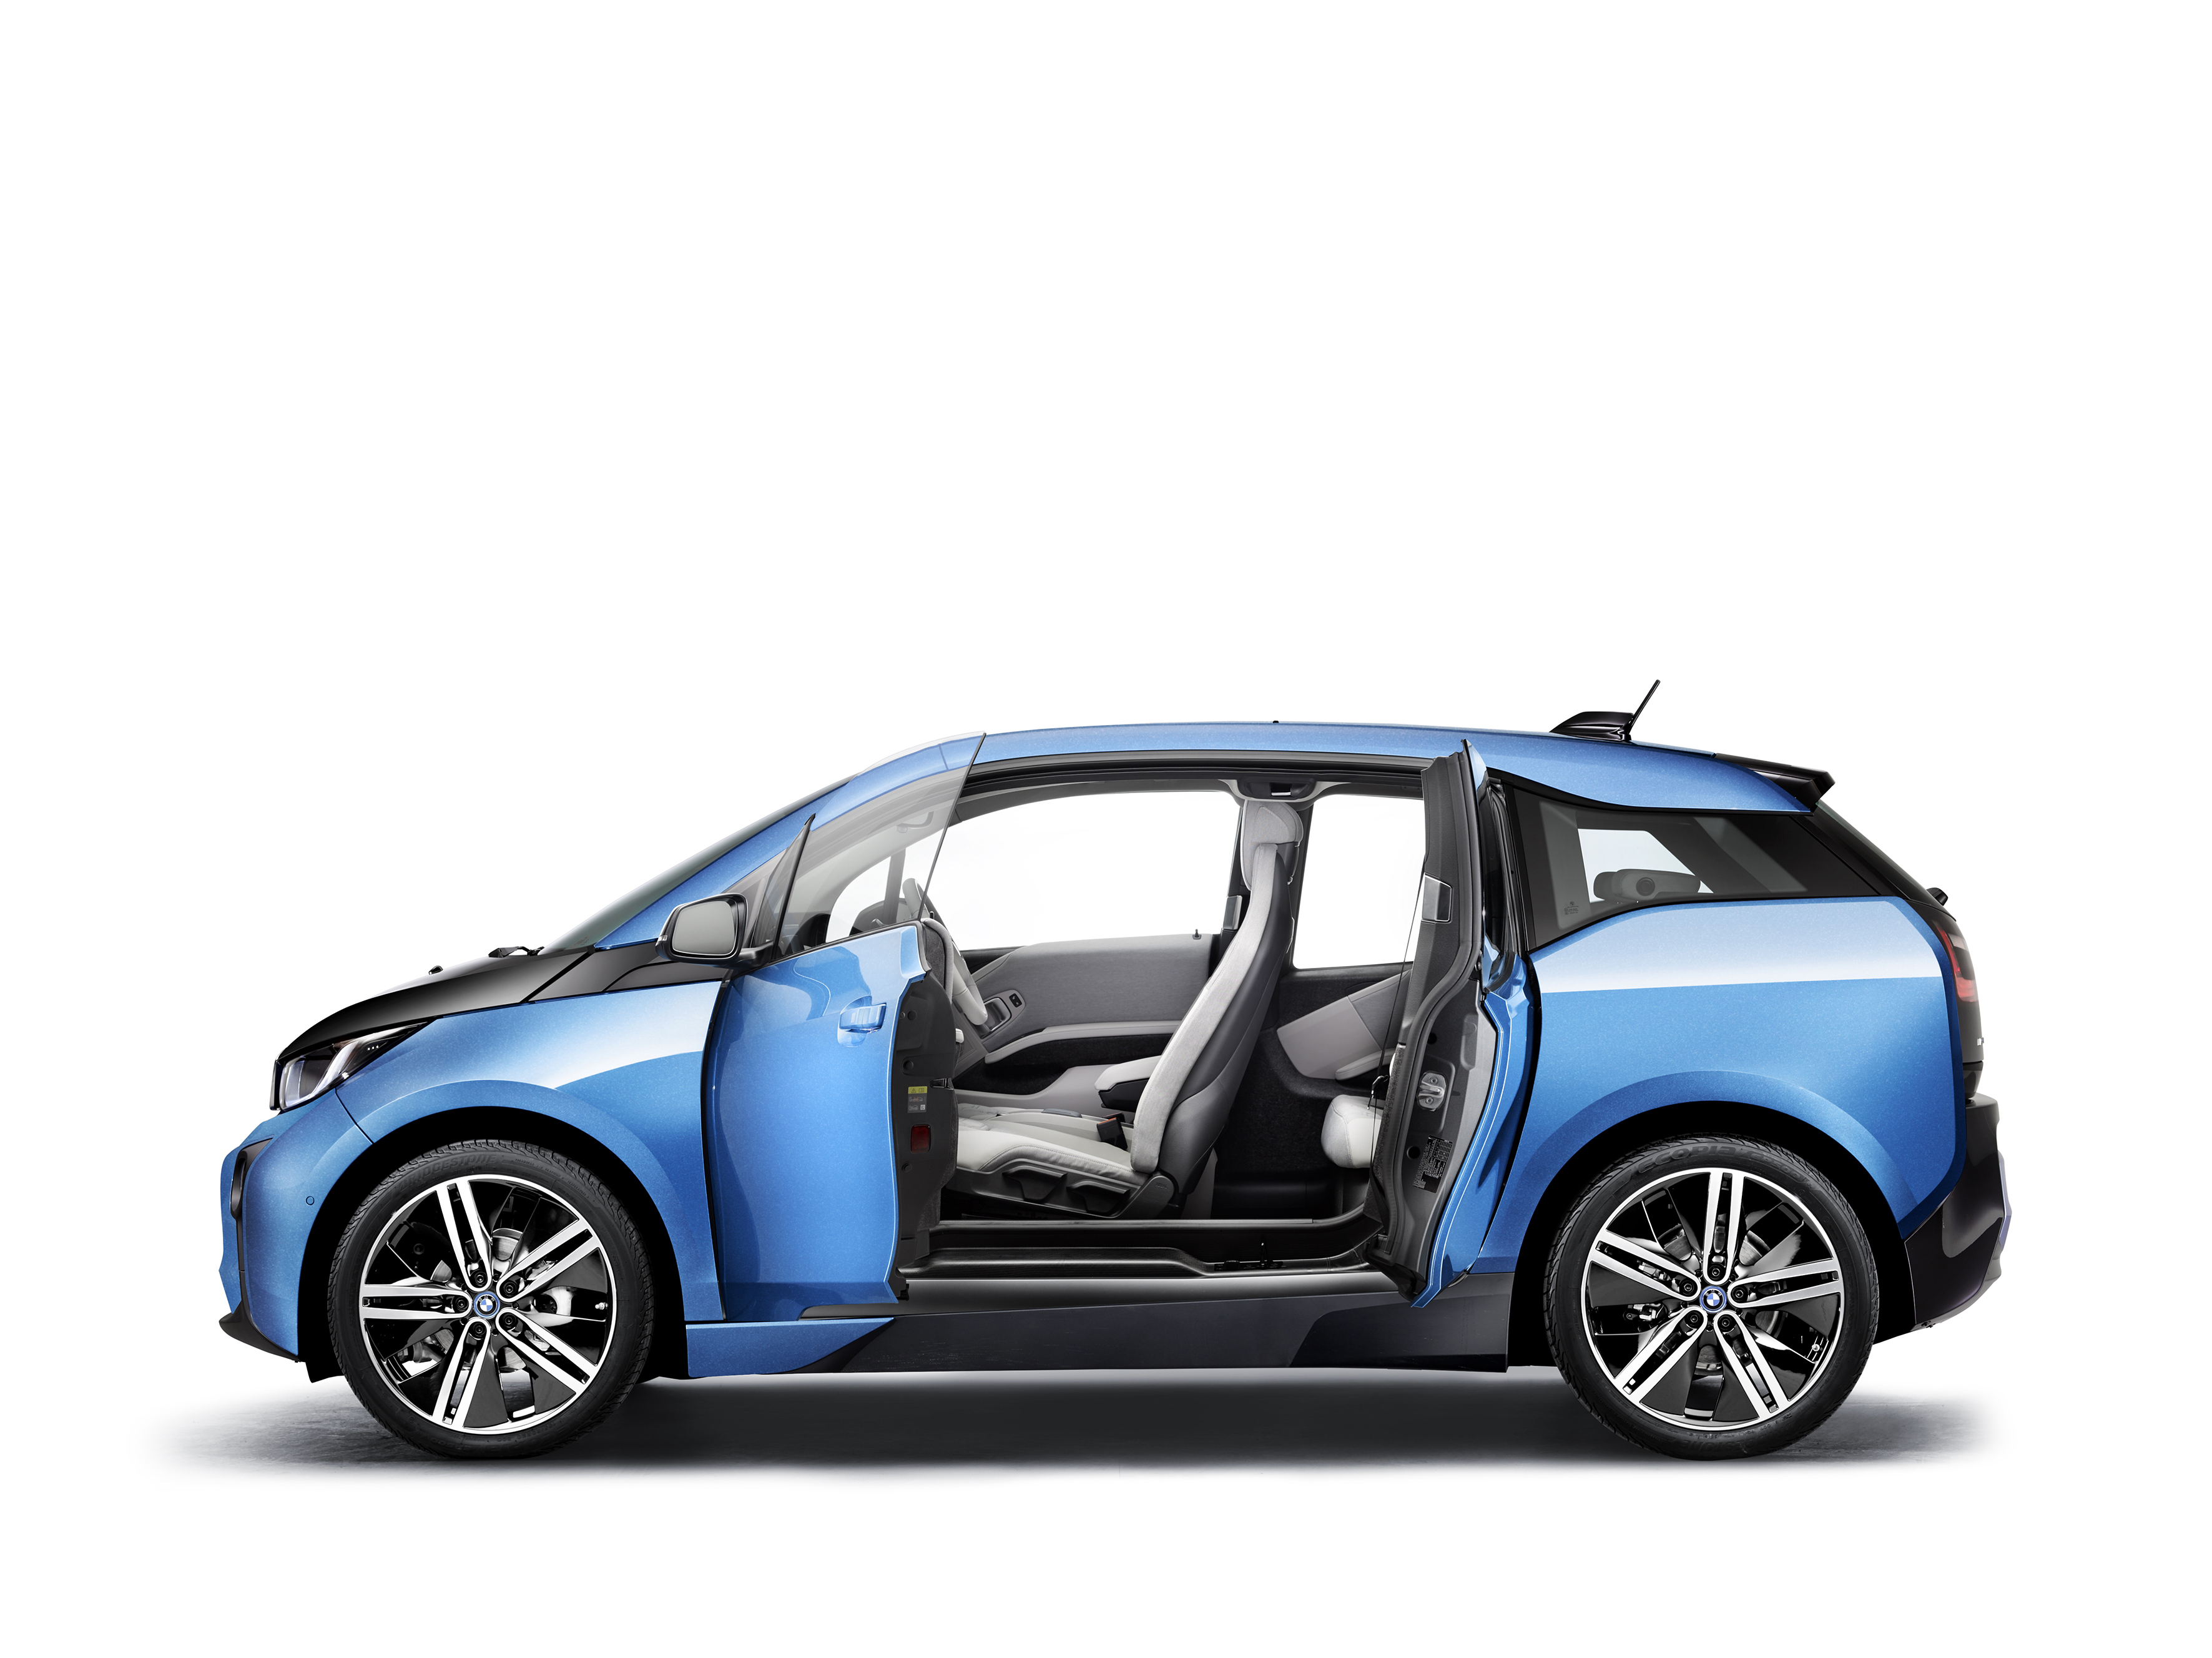 BMW-i3-protonic-blue-6